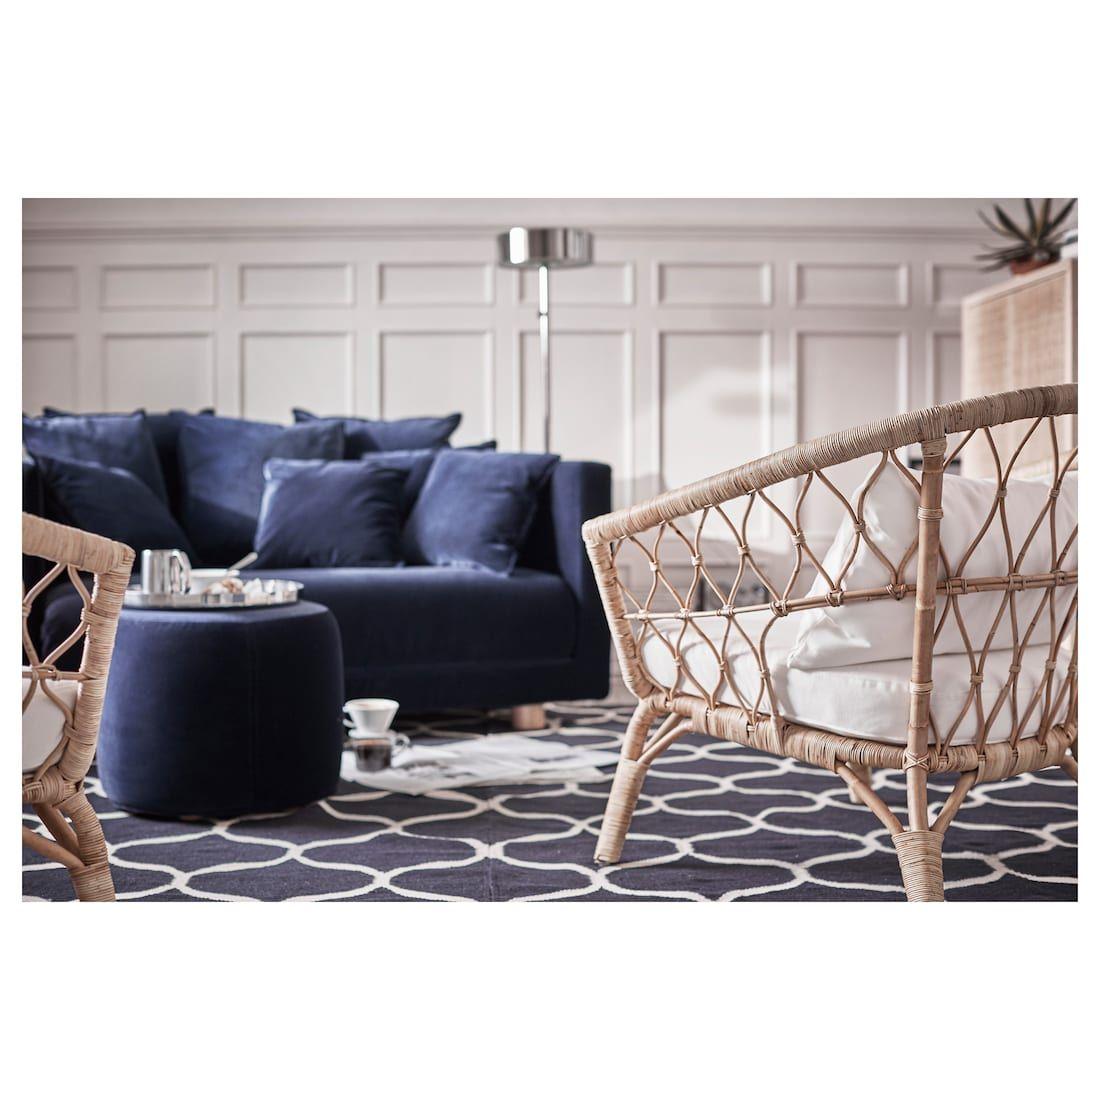 "Ottoman, Sandbacka dark blue, 19 5/8x19 5/8 "" | Ikea ..."